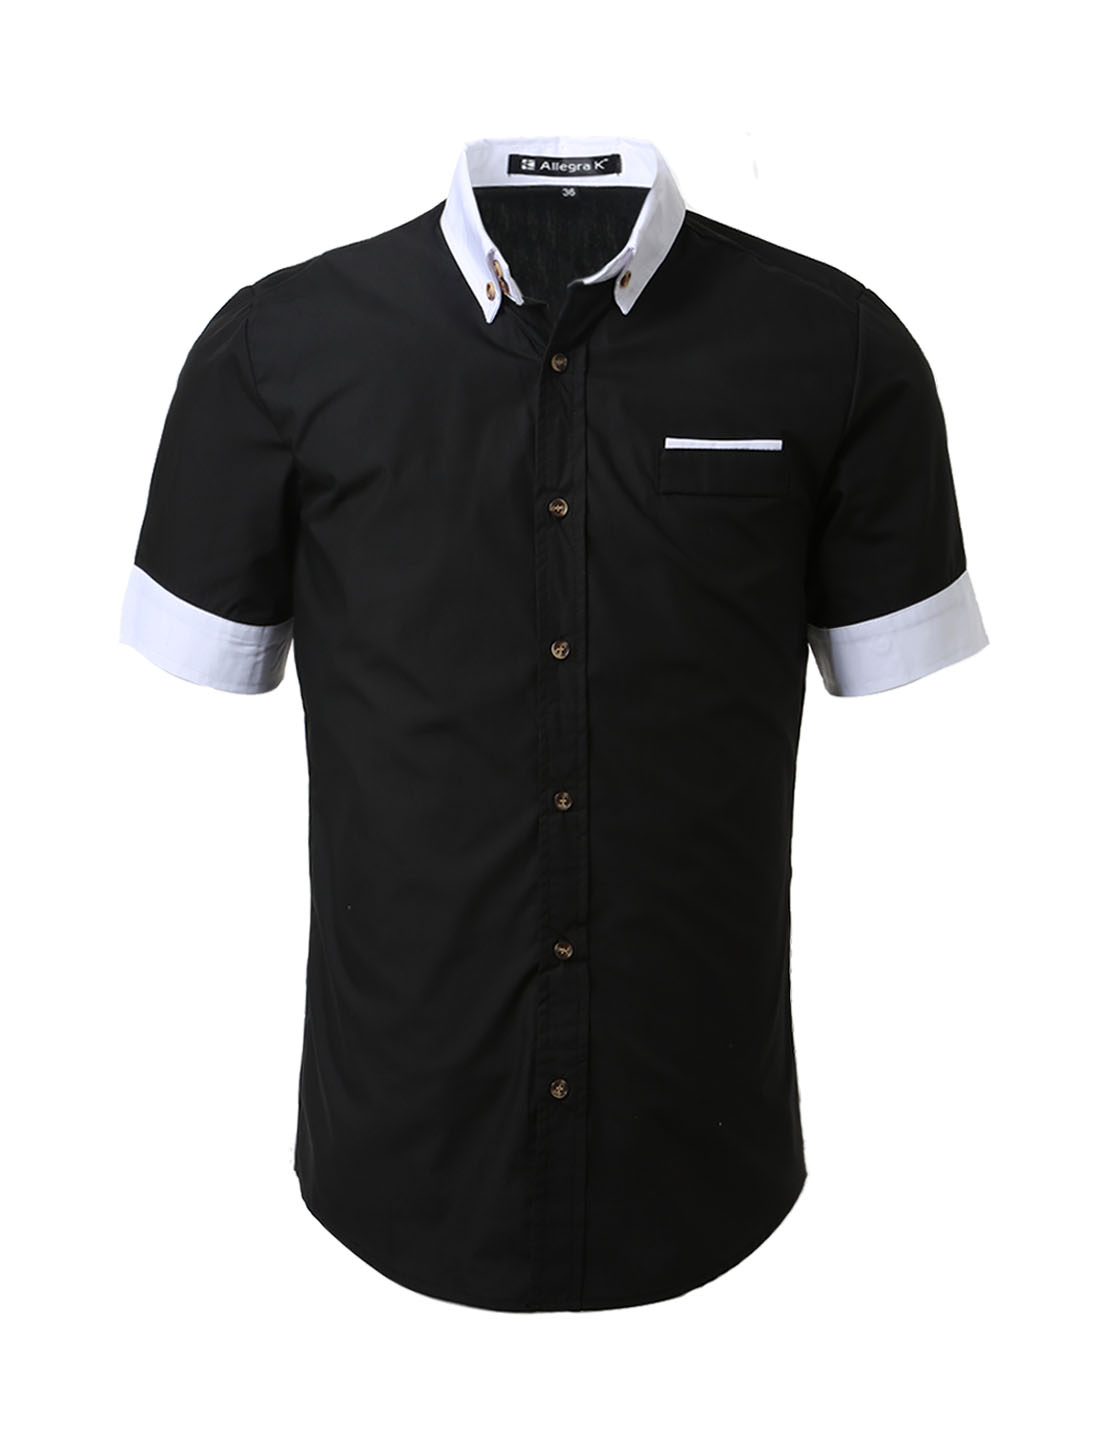 Men short sleeve button down slim fit shirts black s tanga for Boys short sleeve button down shirt